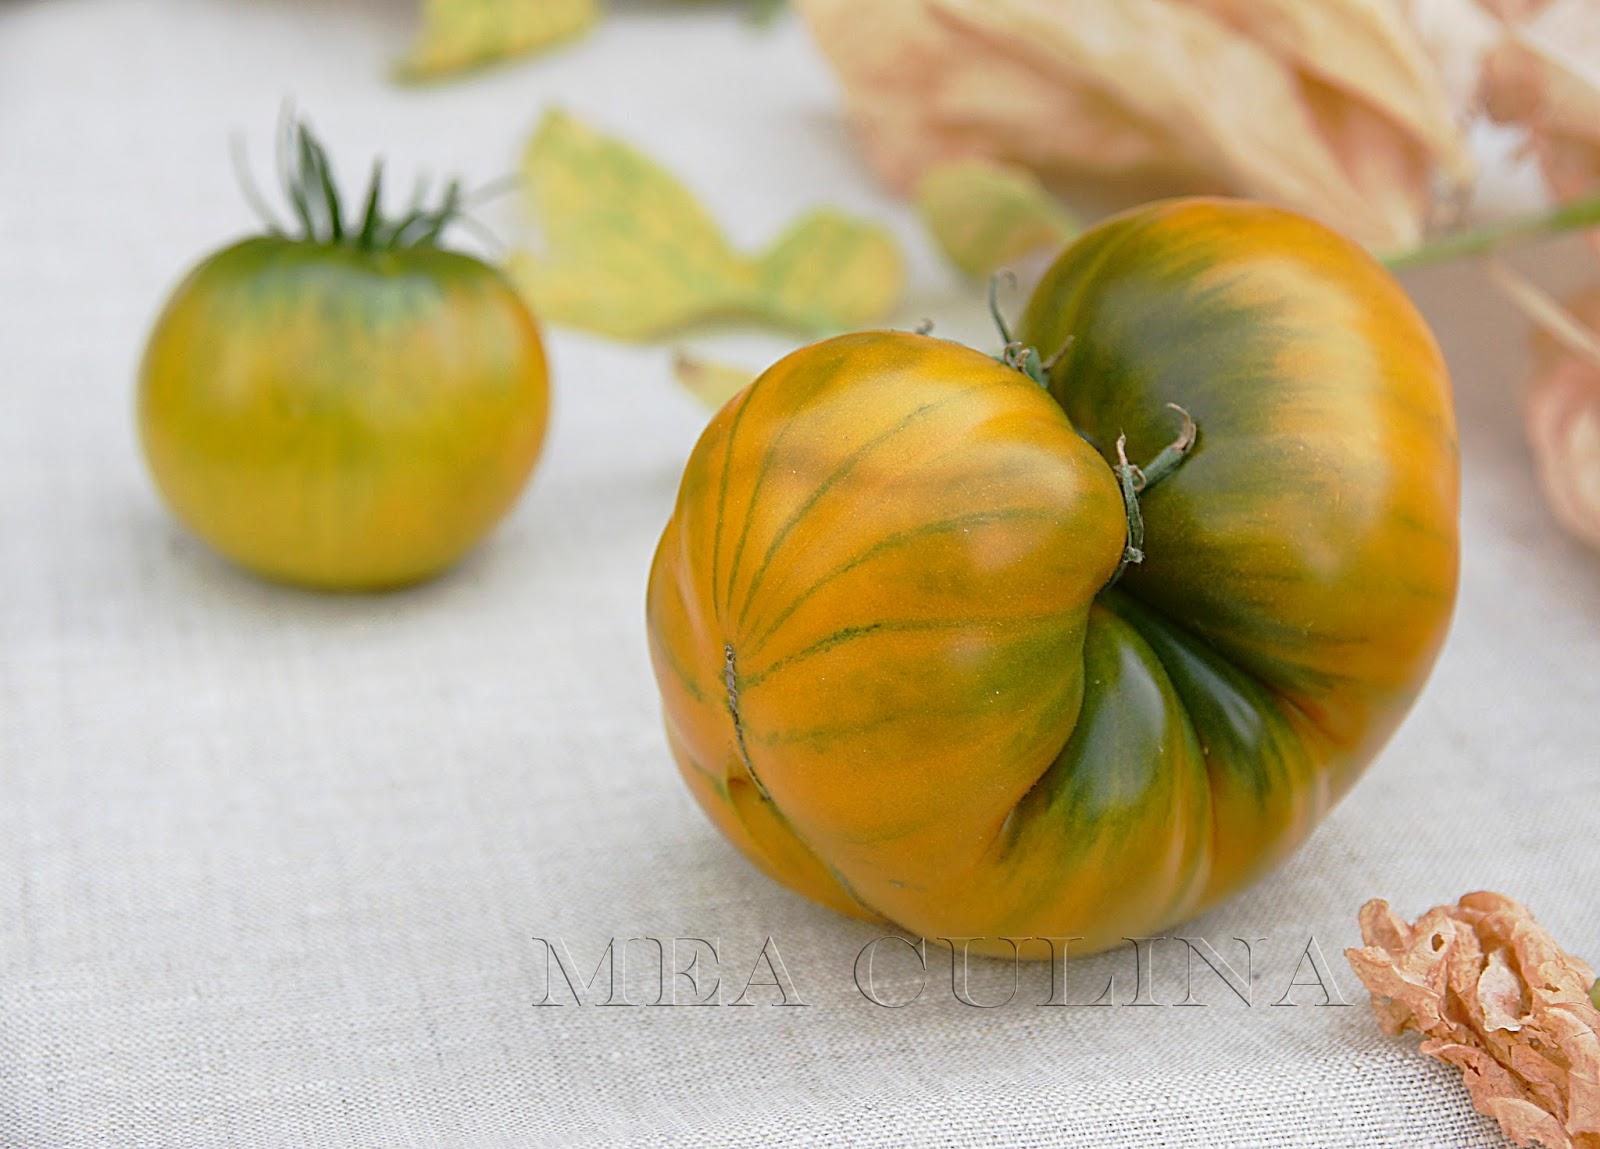 mea culina tomaten shooting bevor die sch nheit dem dip geopfert wird. Black Bedroom Furniture Sets. Home Design Ideas